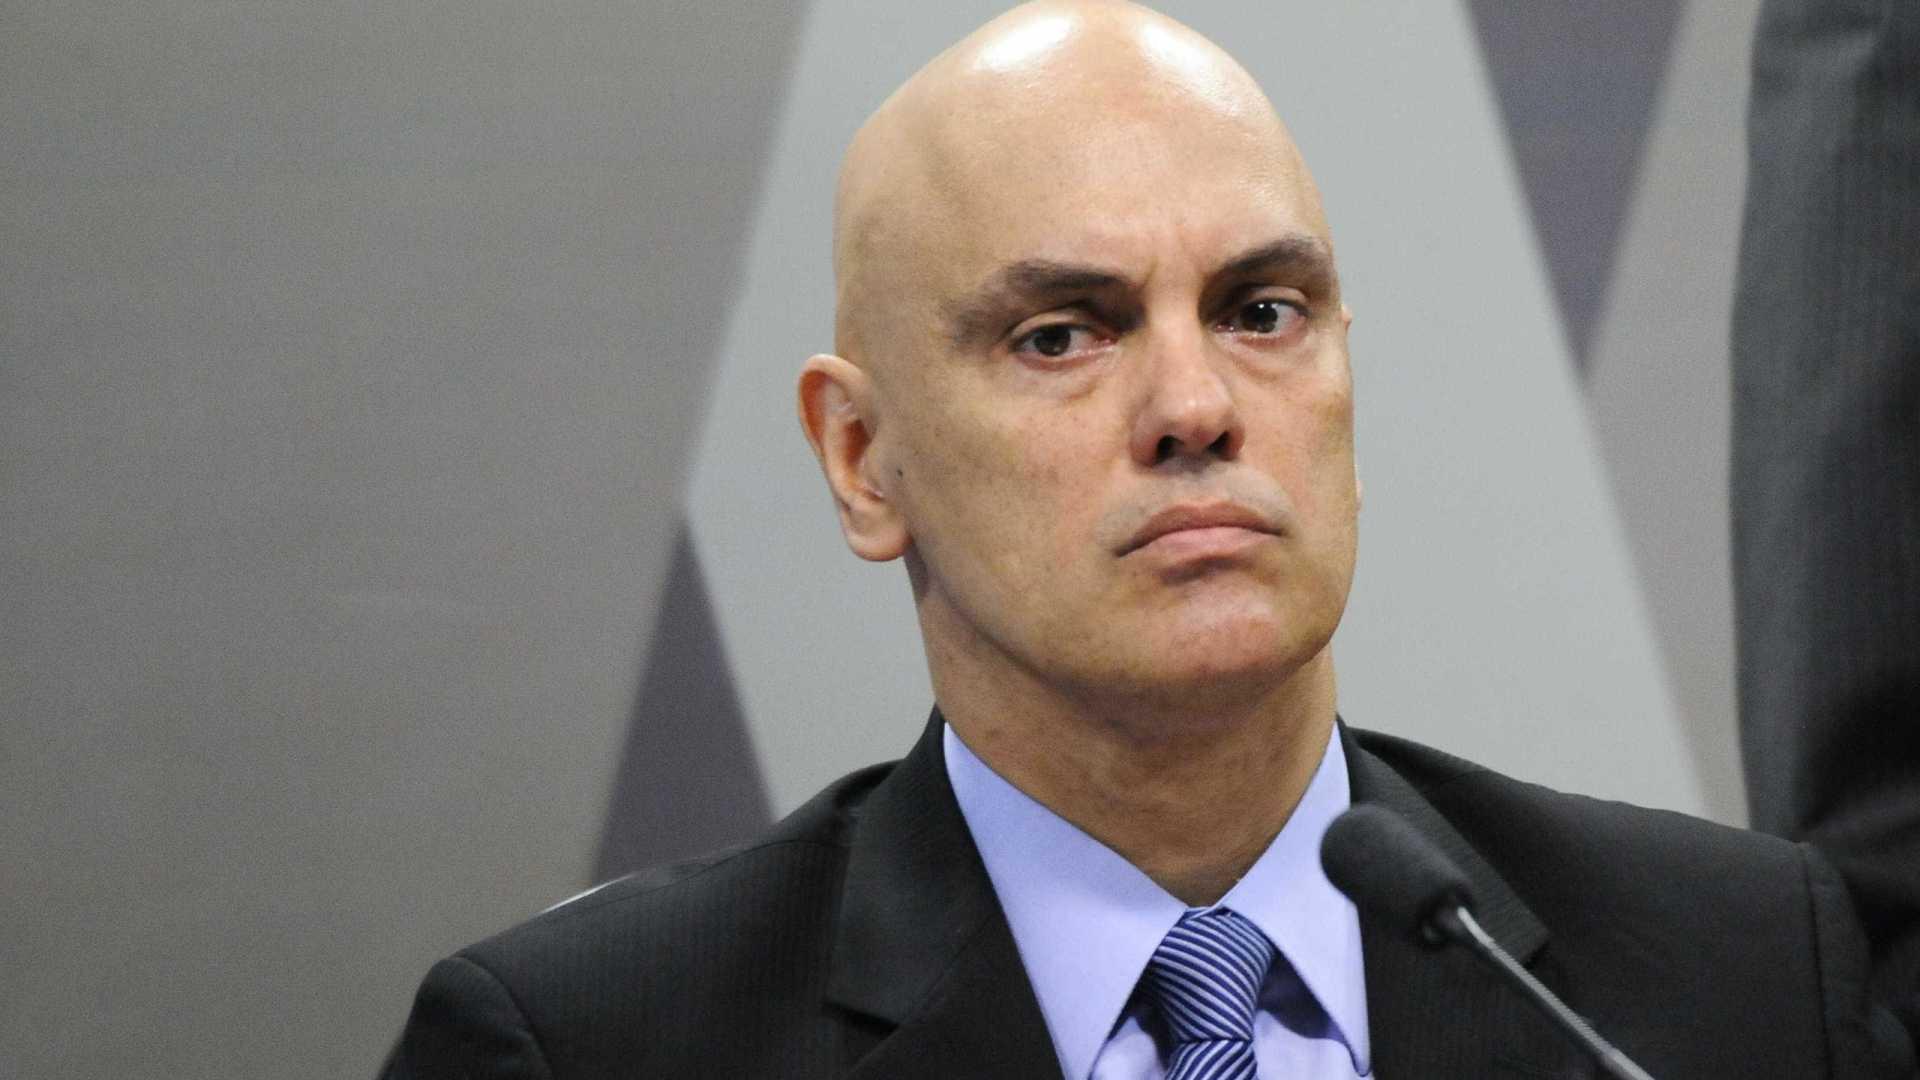 Ministro libera porte de arma para guardas municipais de todo o país